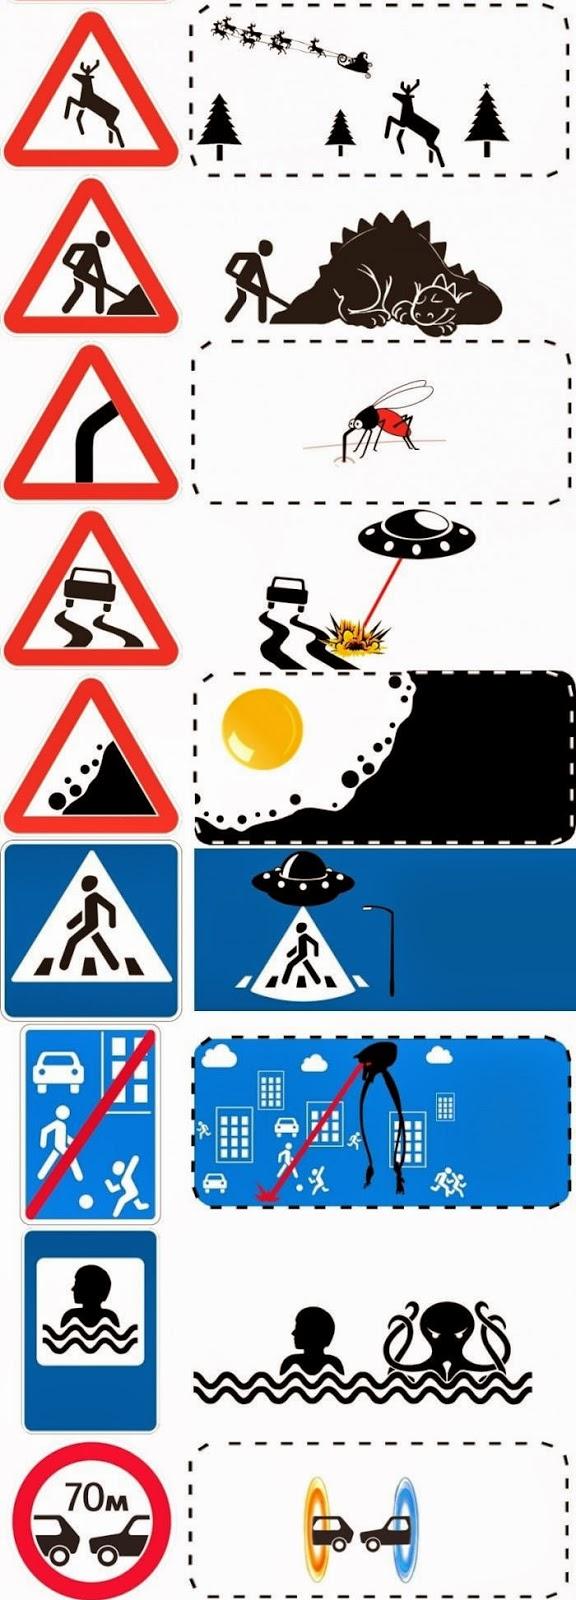 rambu lalu lintas terunik, rambu lalulintas, lalulintas, rambu terunik, lalu lintas unik